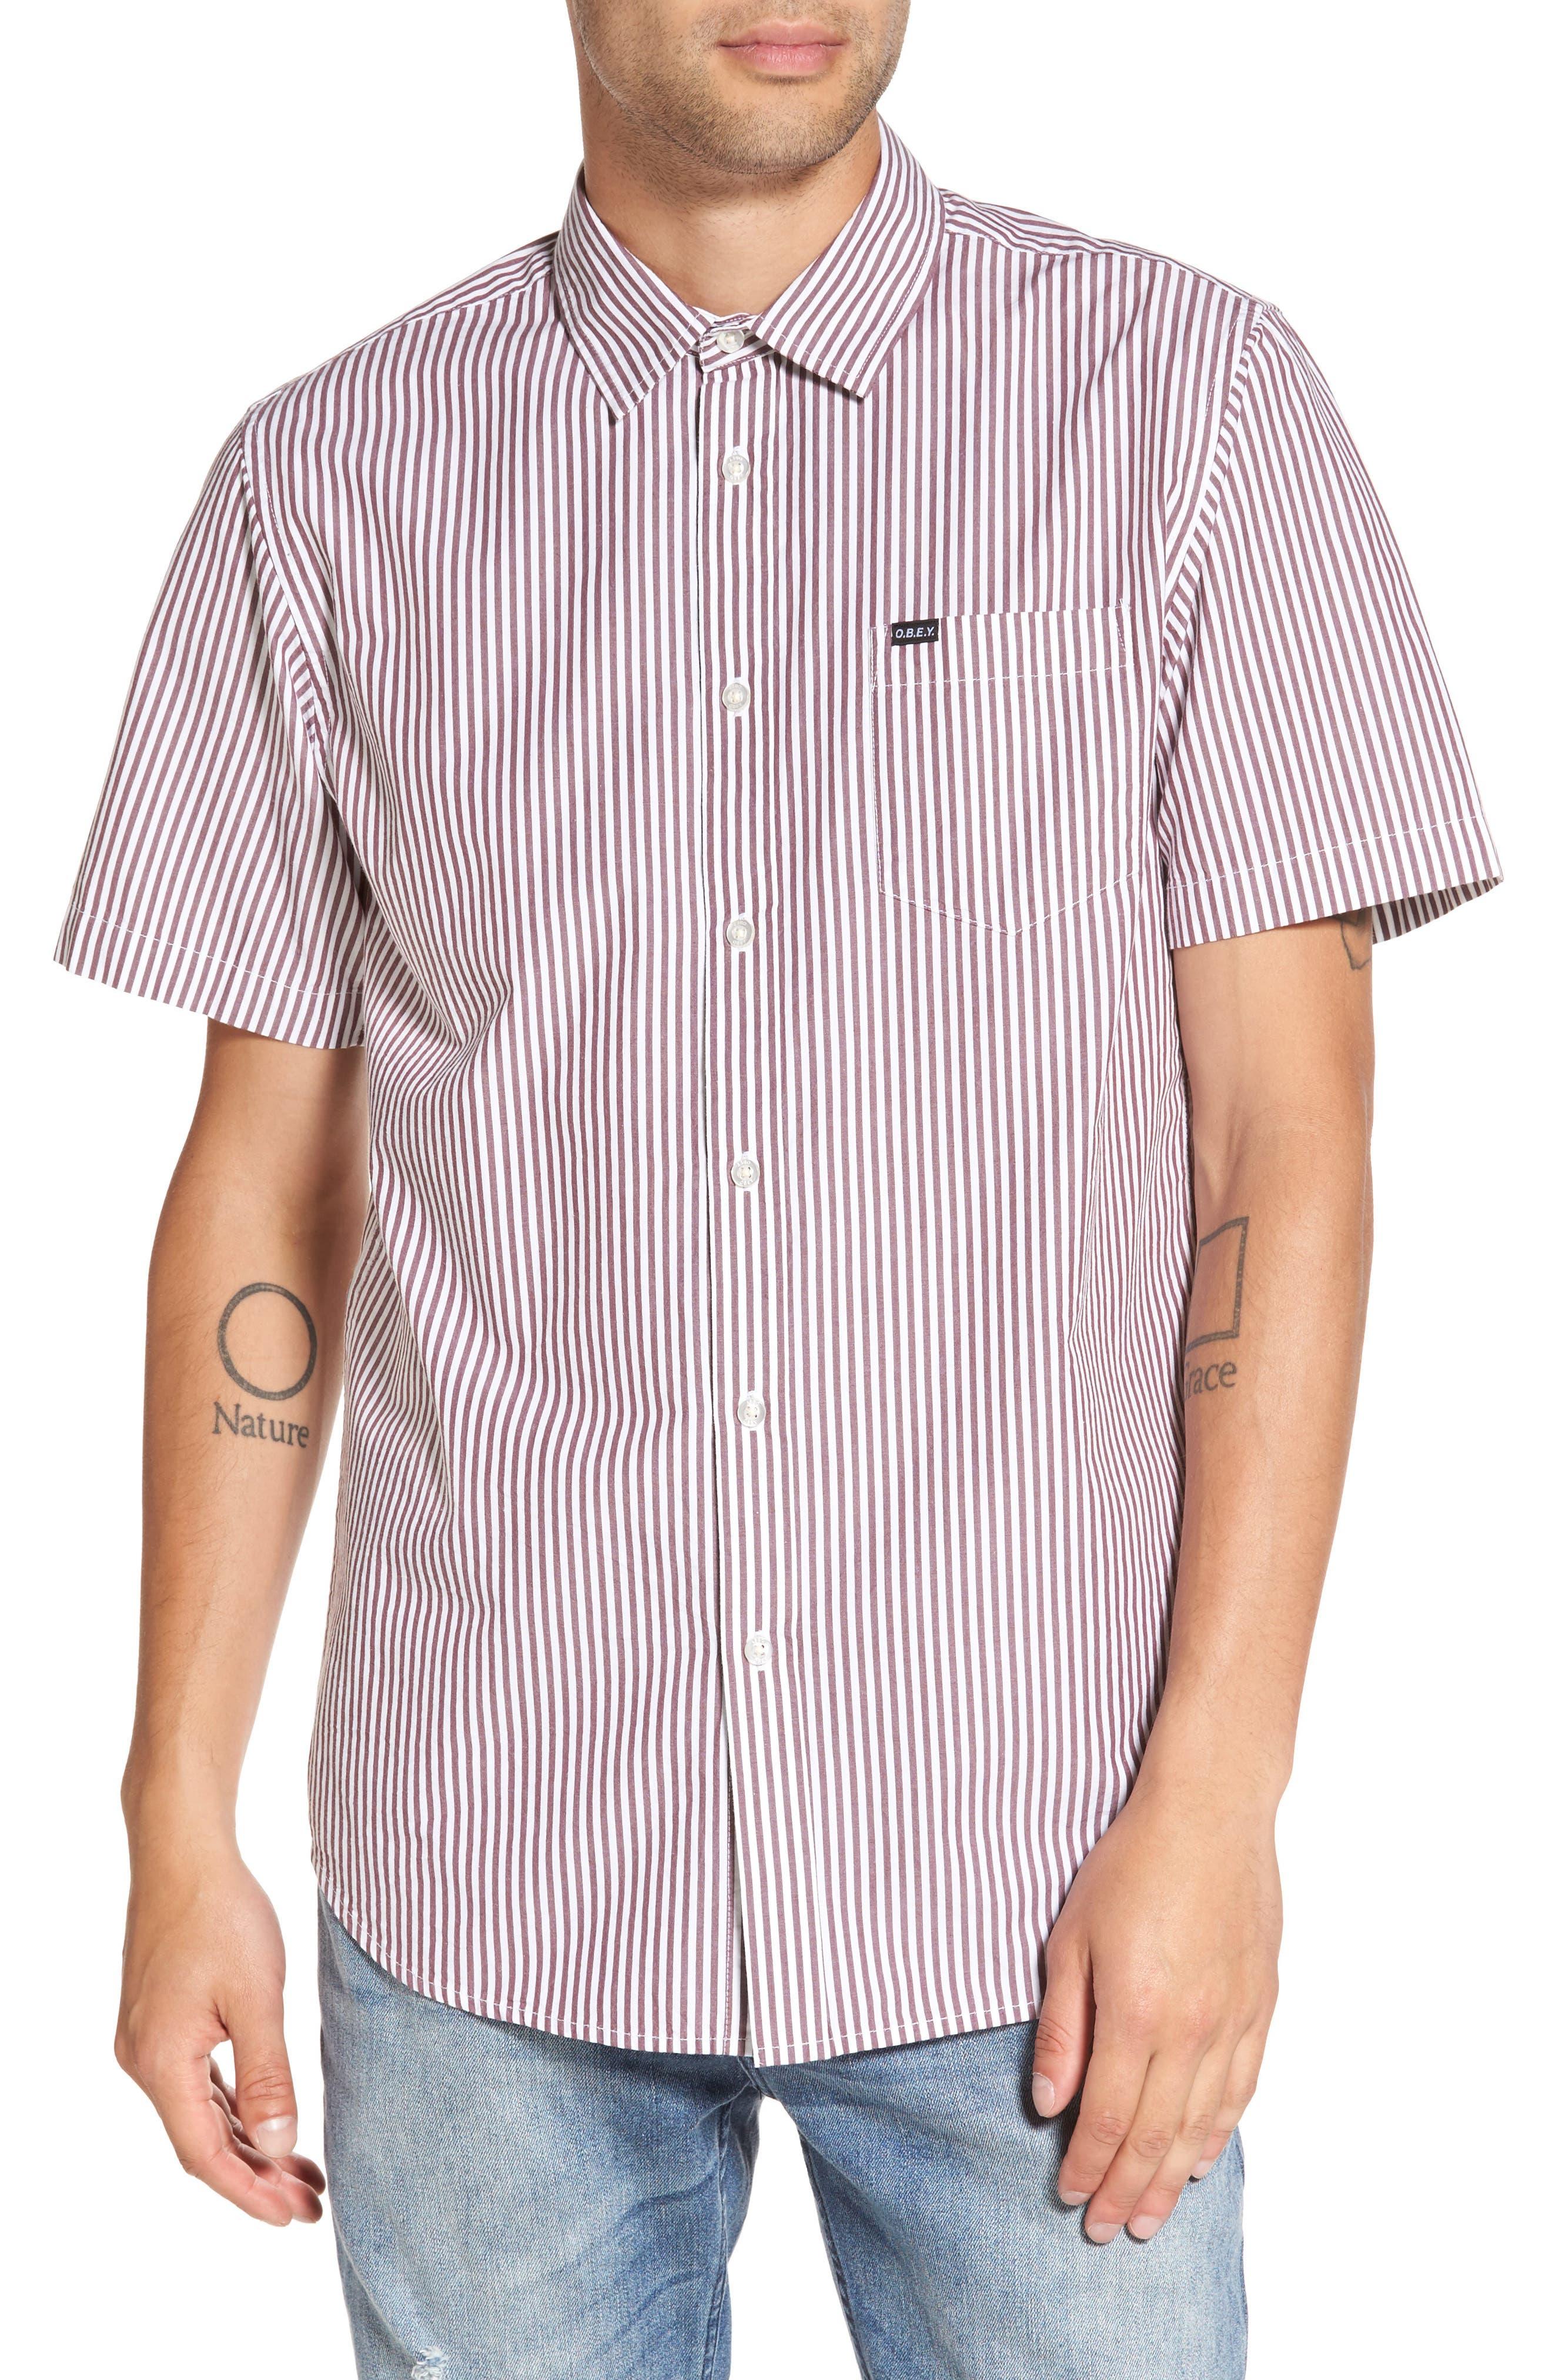 Main Image - Obey Adario Stripe Woven Shirt